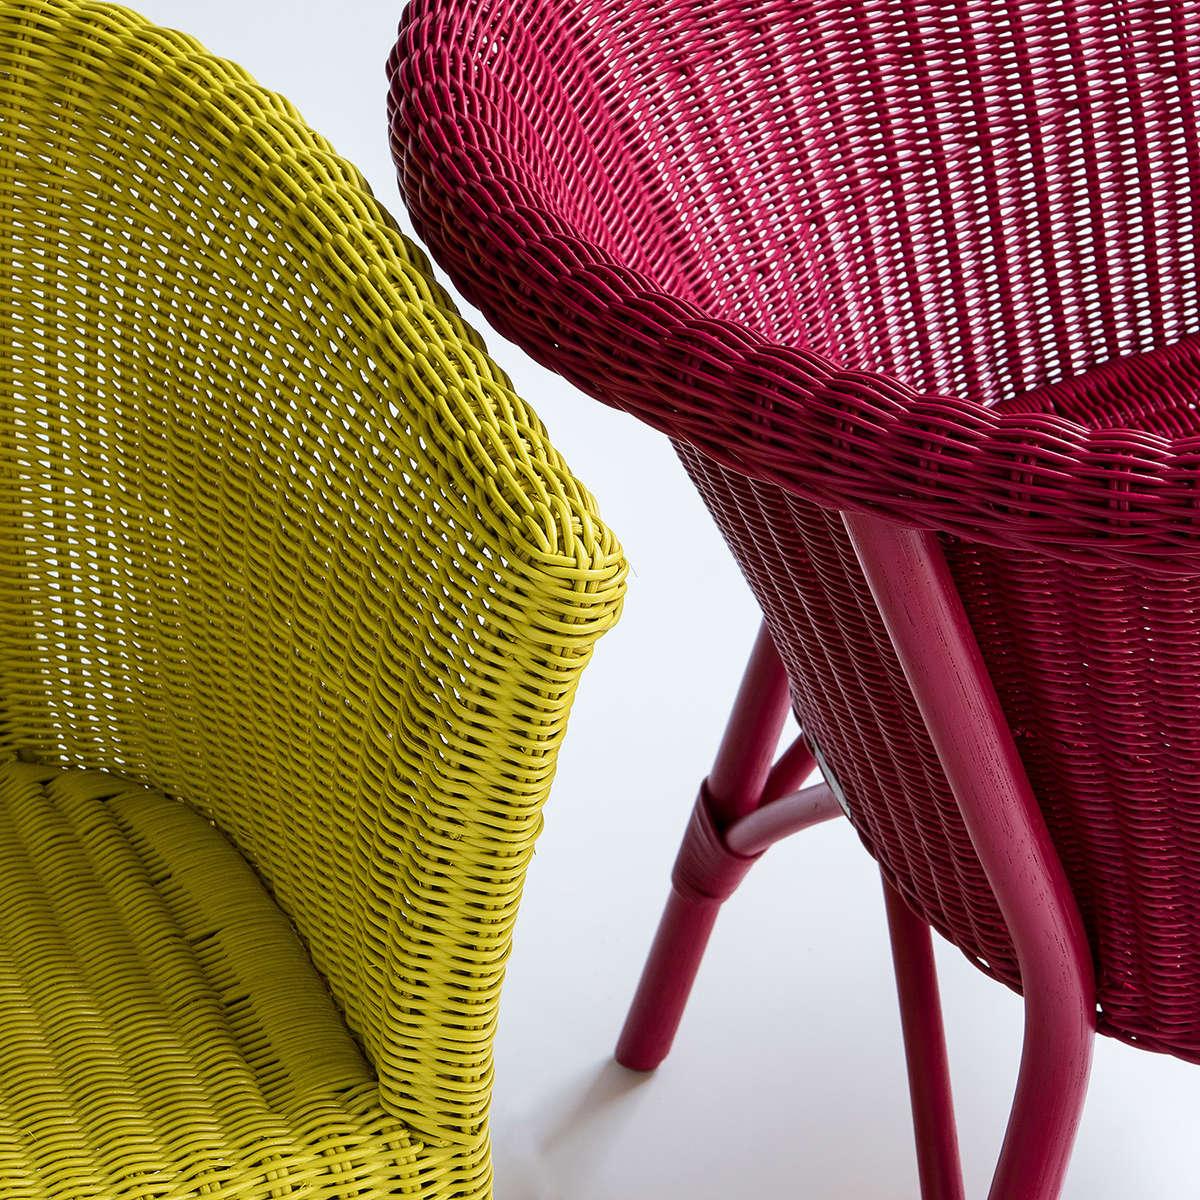 Bonacina Cassis Dining Chair Detail